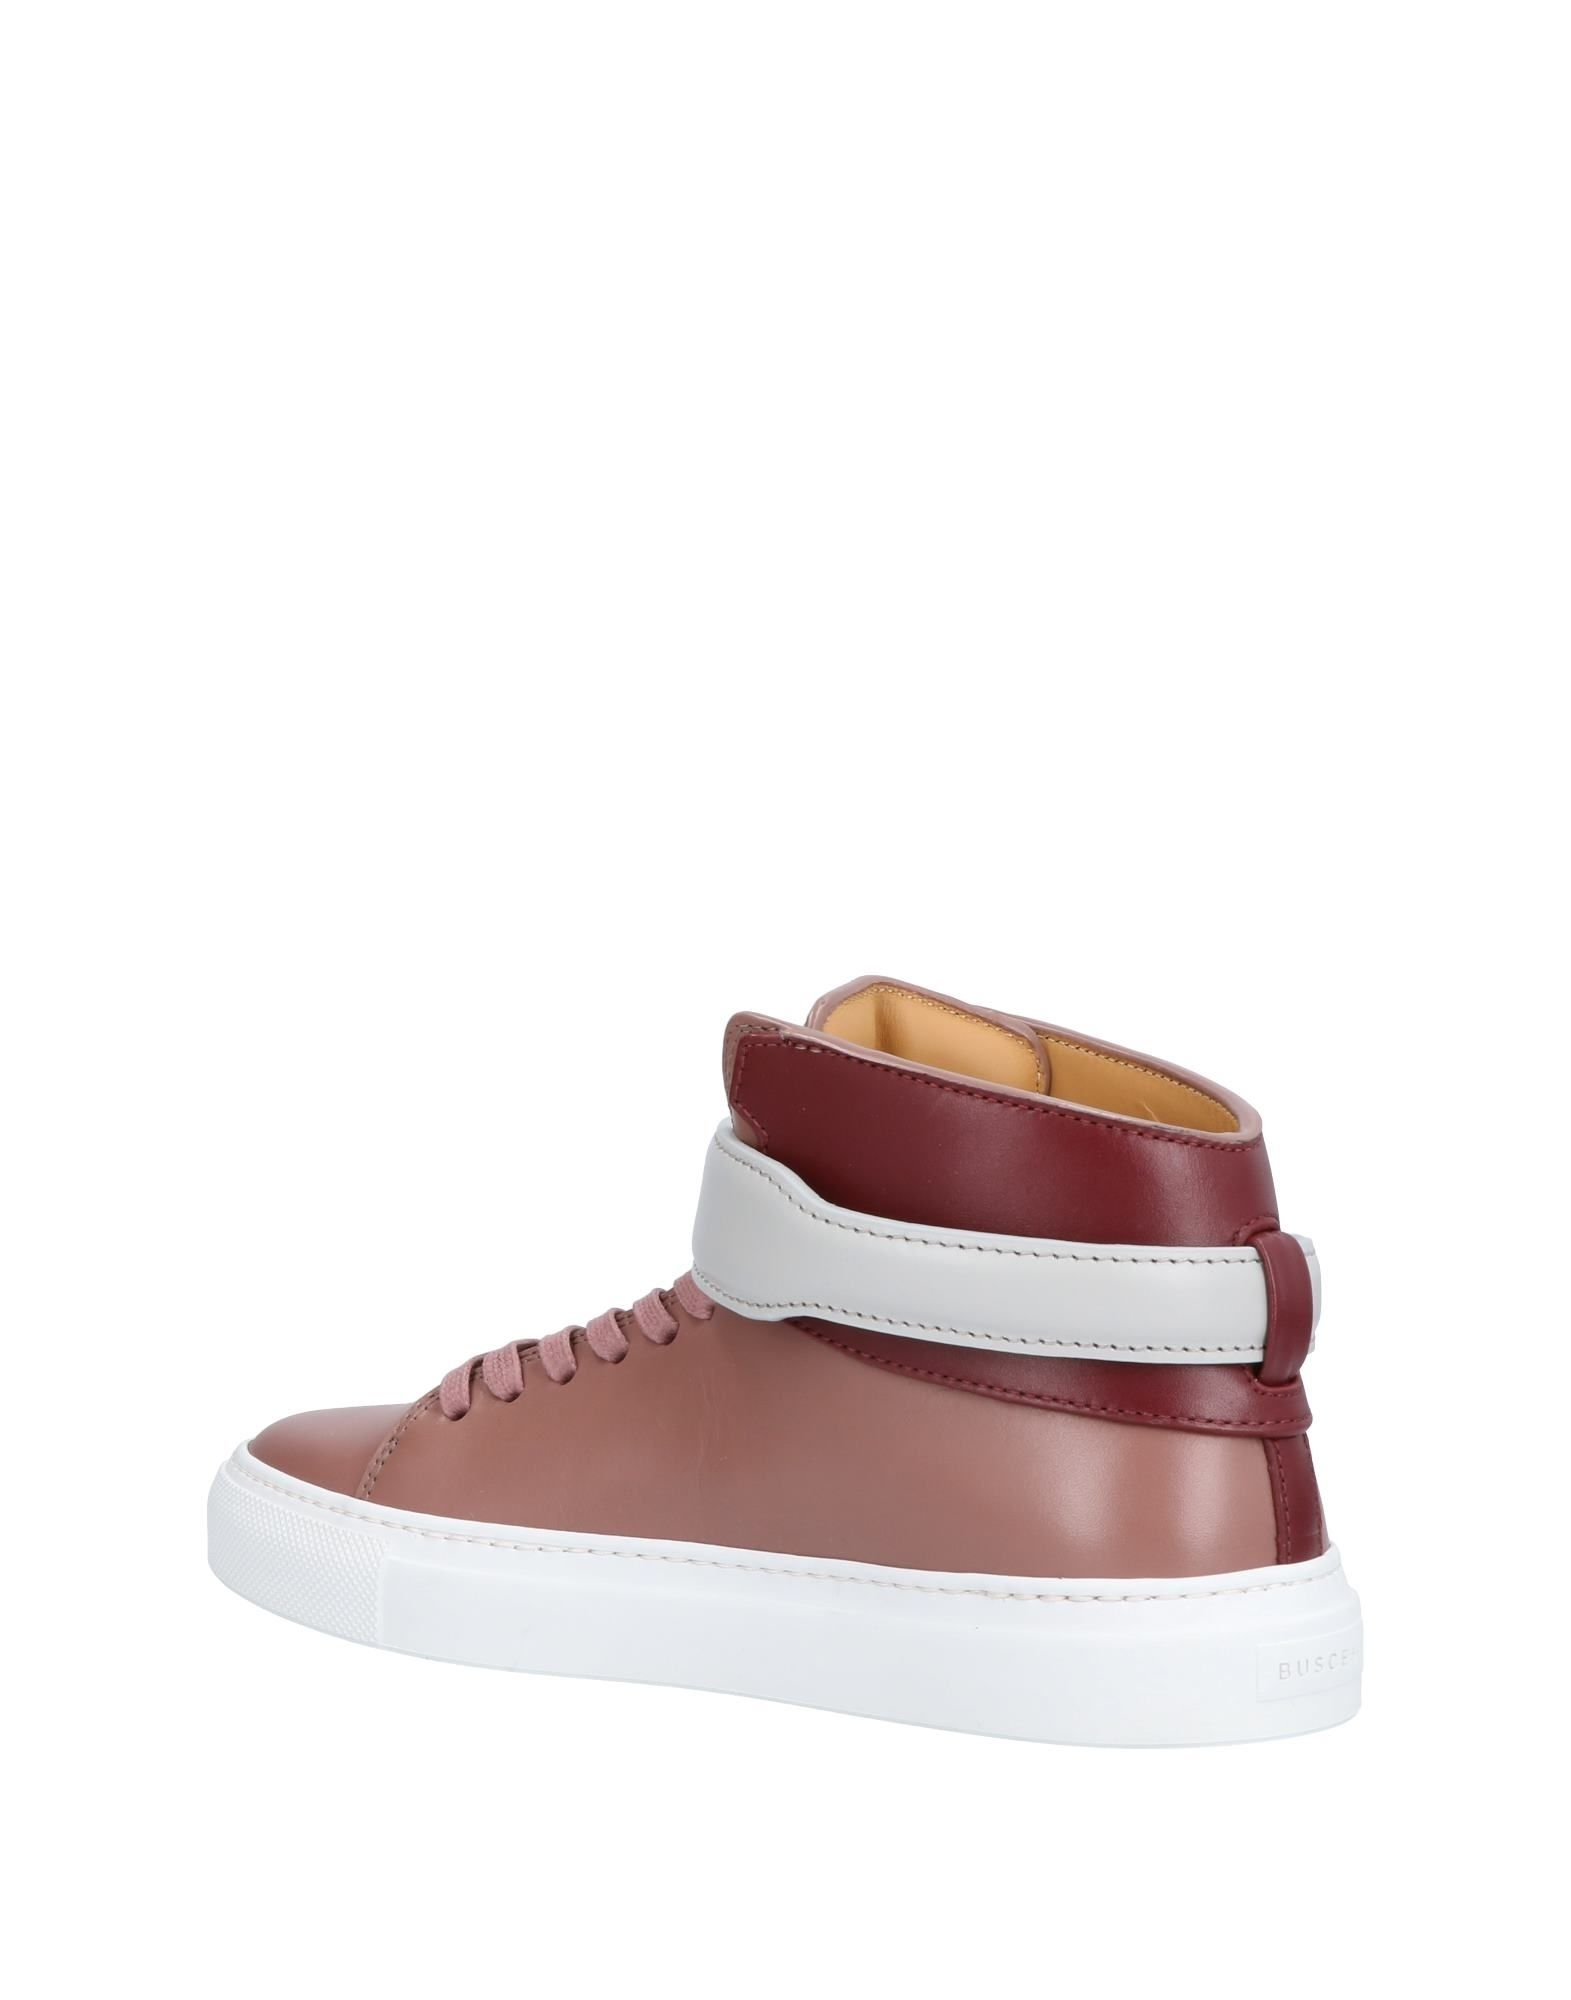 Buscemi Sneakers Damen gut  11473108ILGünstige gut Damen aussehende Schuhe dd73b3